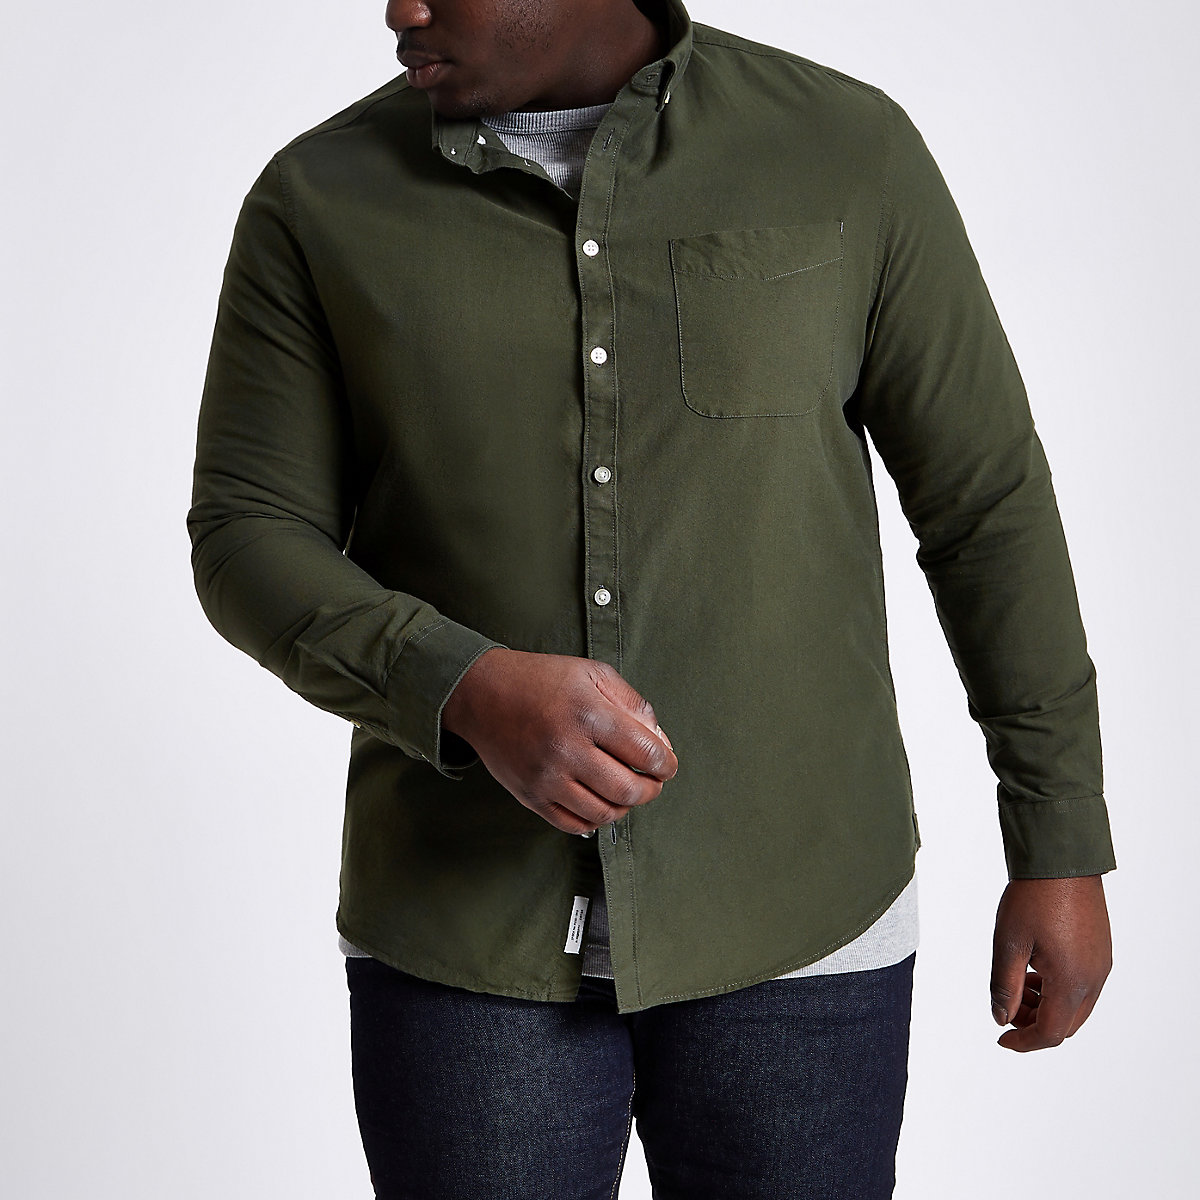 Grünes, langärmliges Oxford Hemd